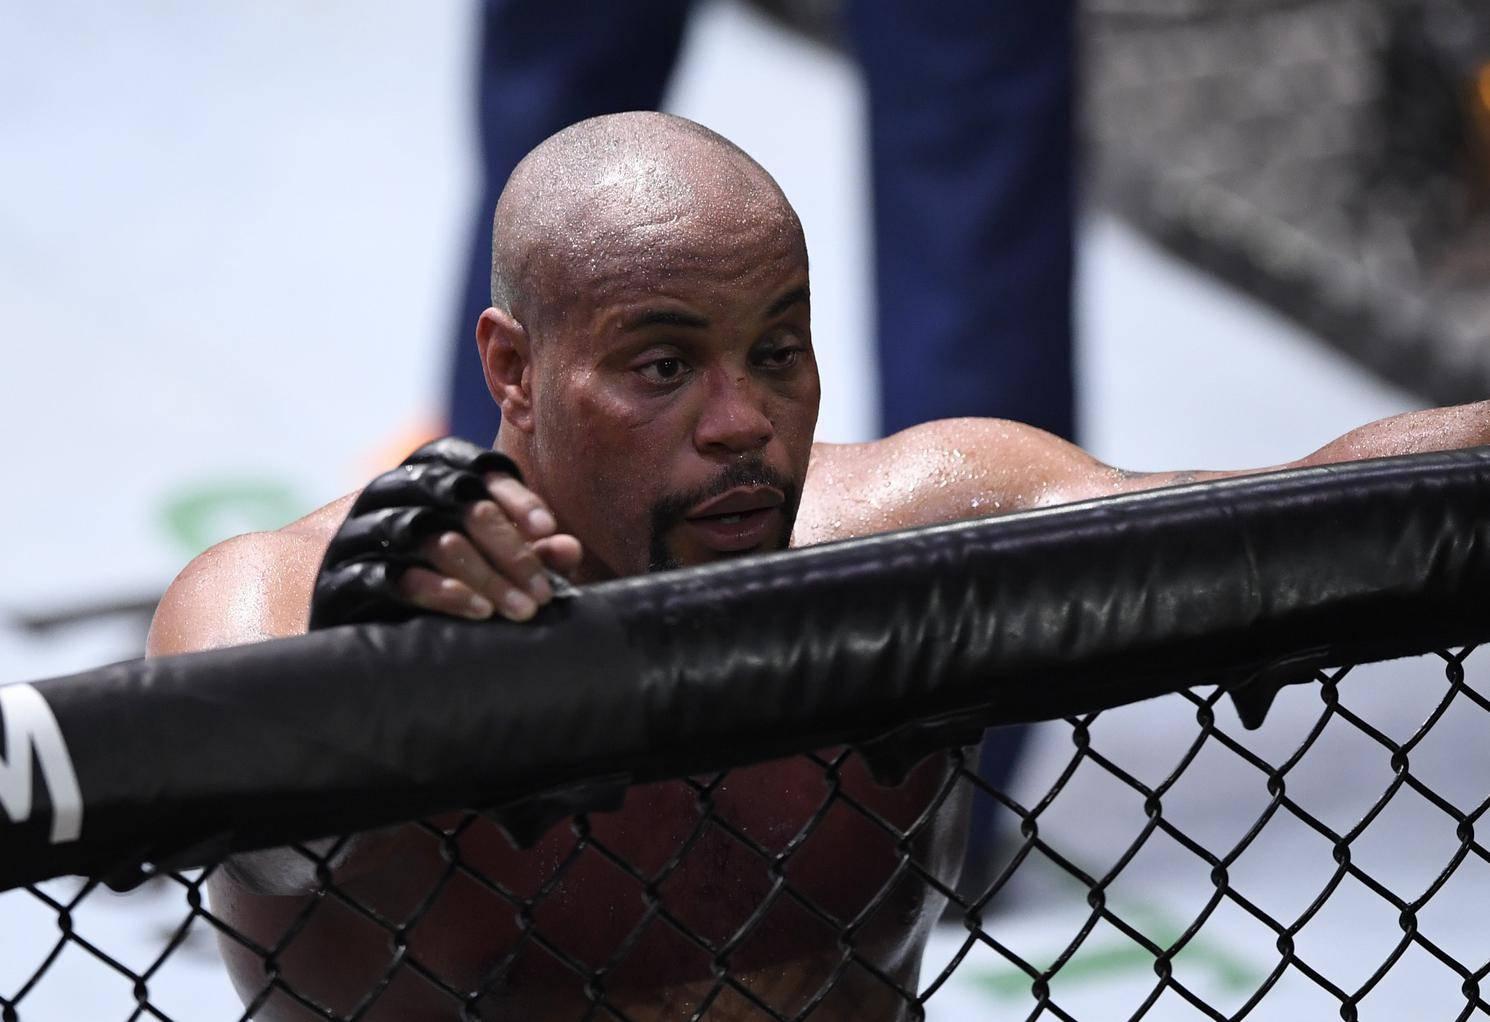 UFC 252: Miocic v Cormier 3